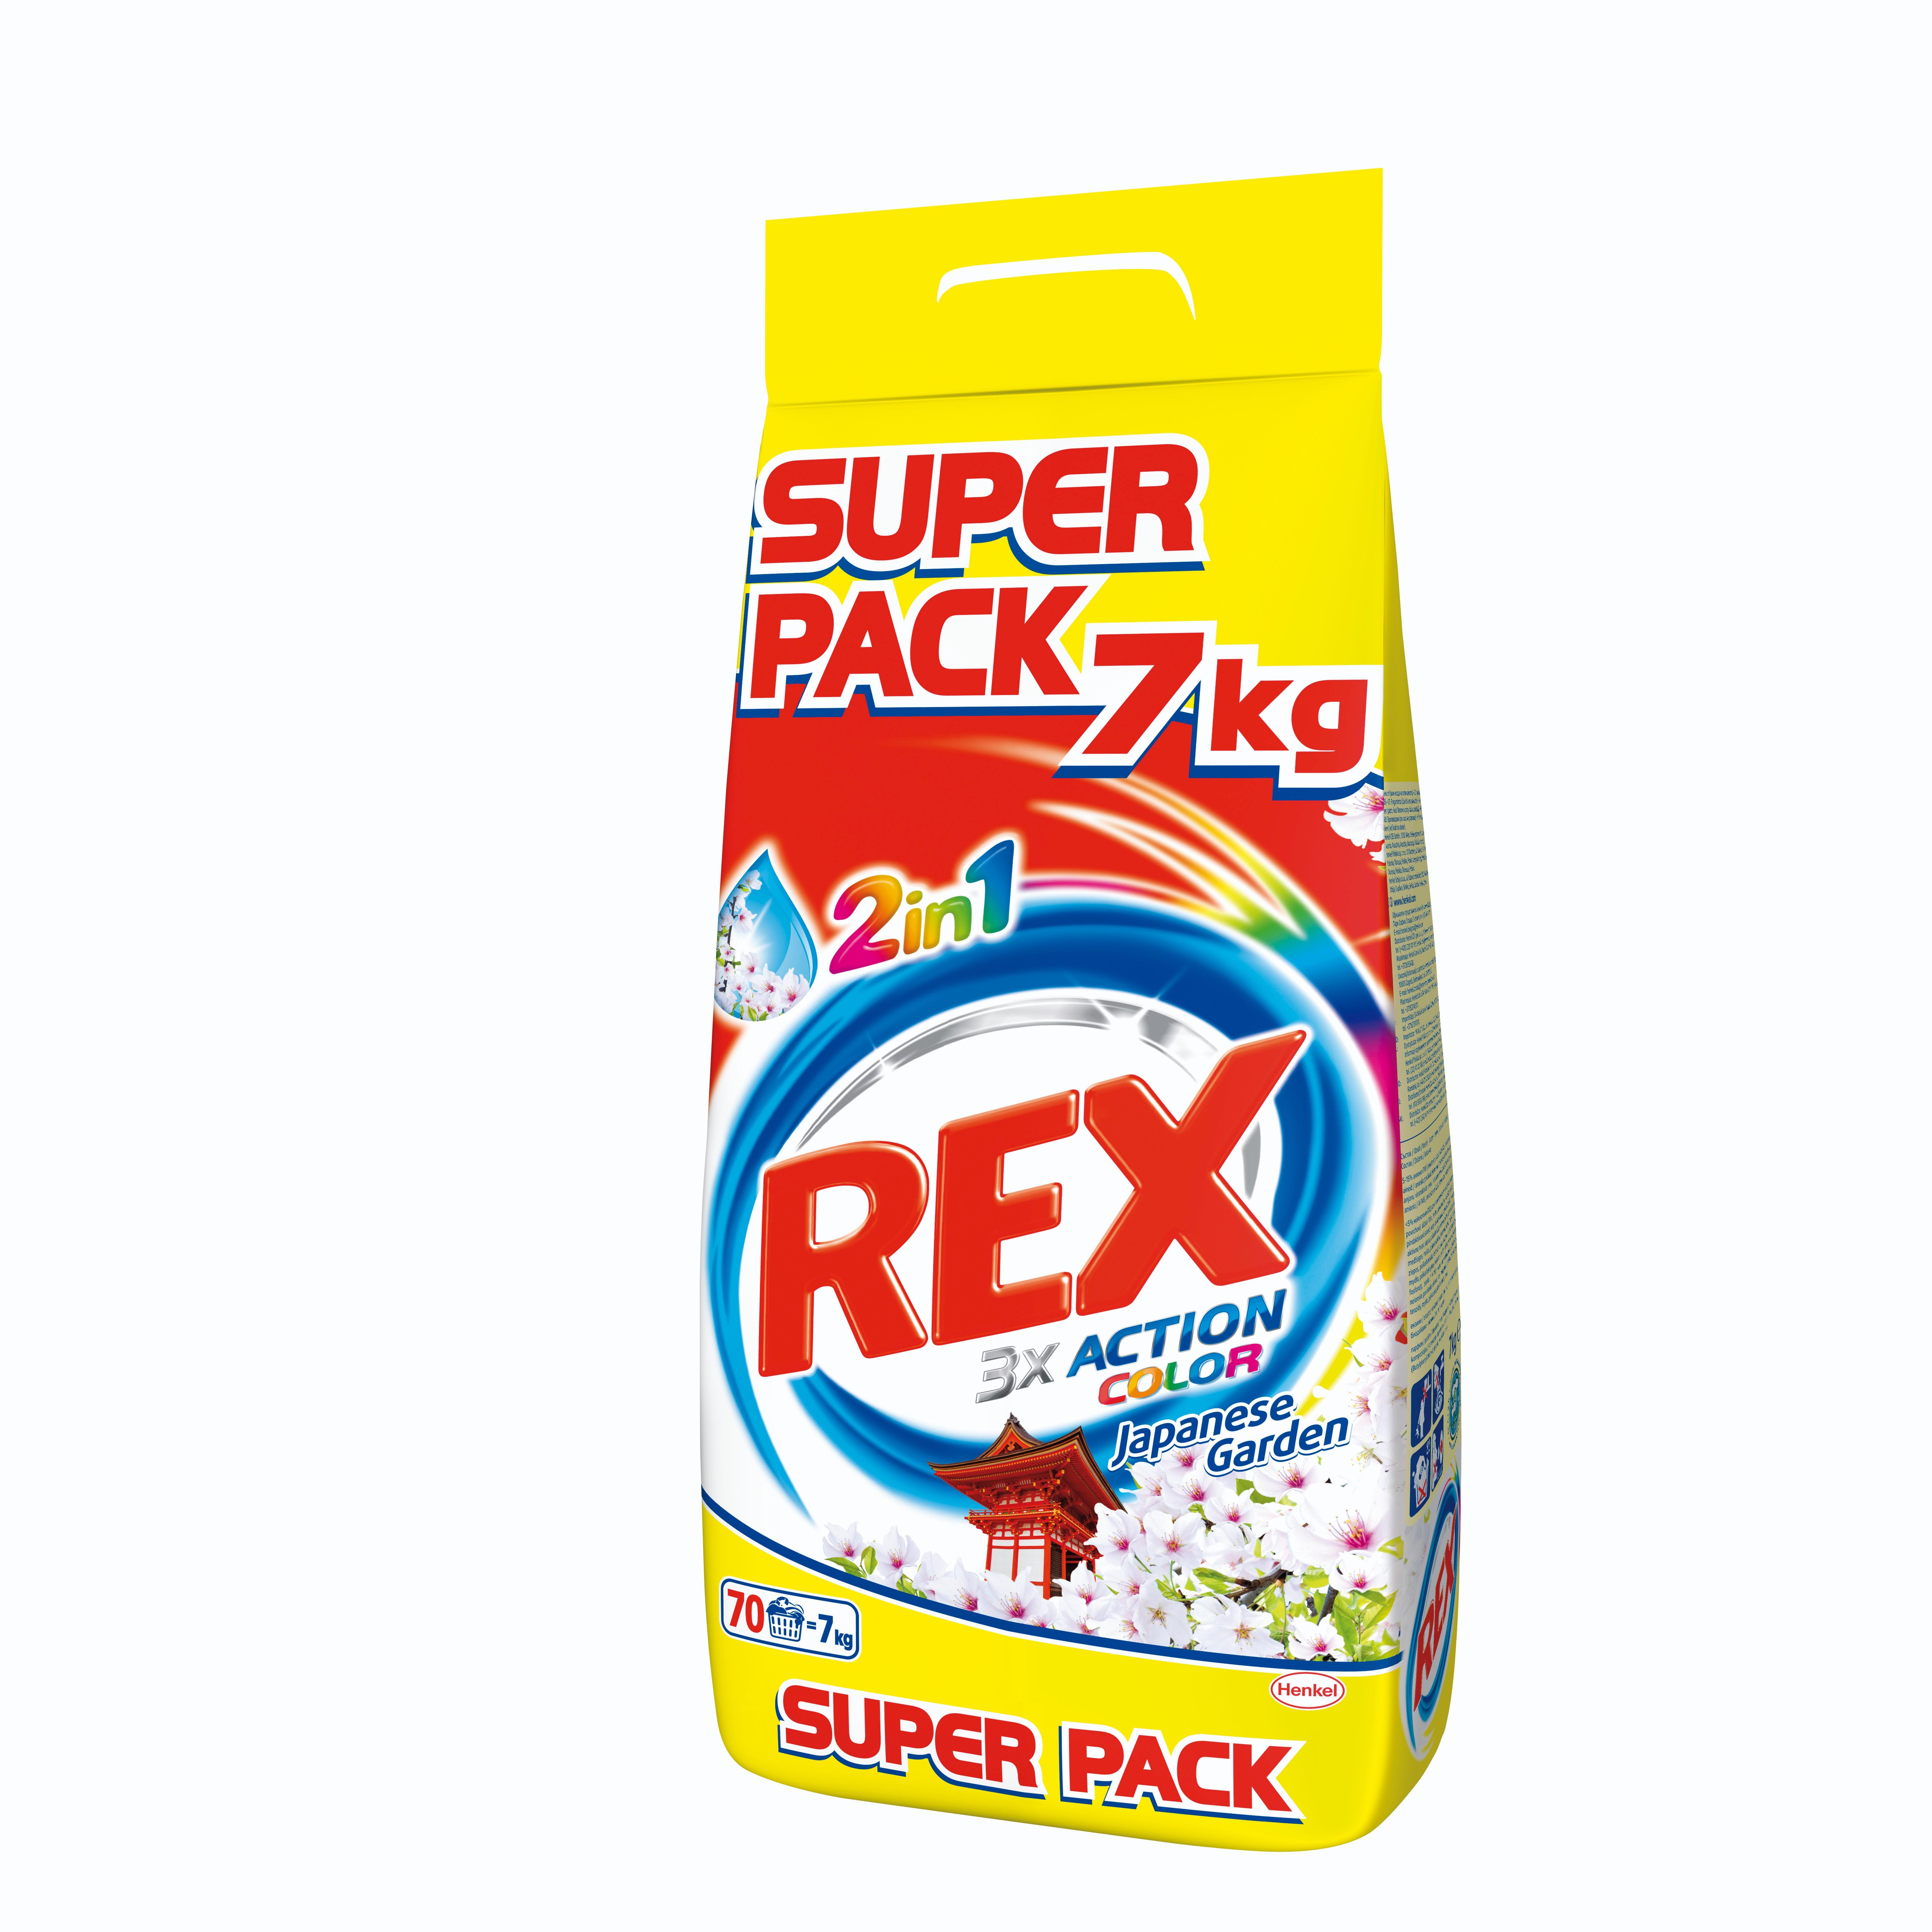 Rex 2in1 Japanese Garden, proszek do prania tkanin kolorowych, 7 kg Image